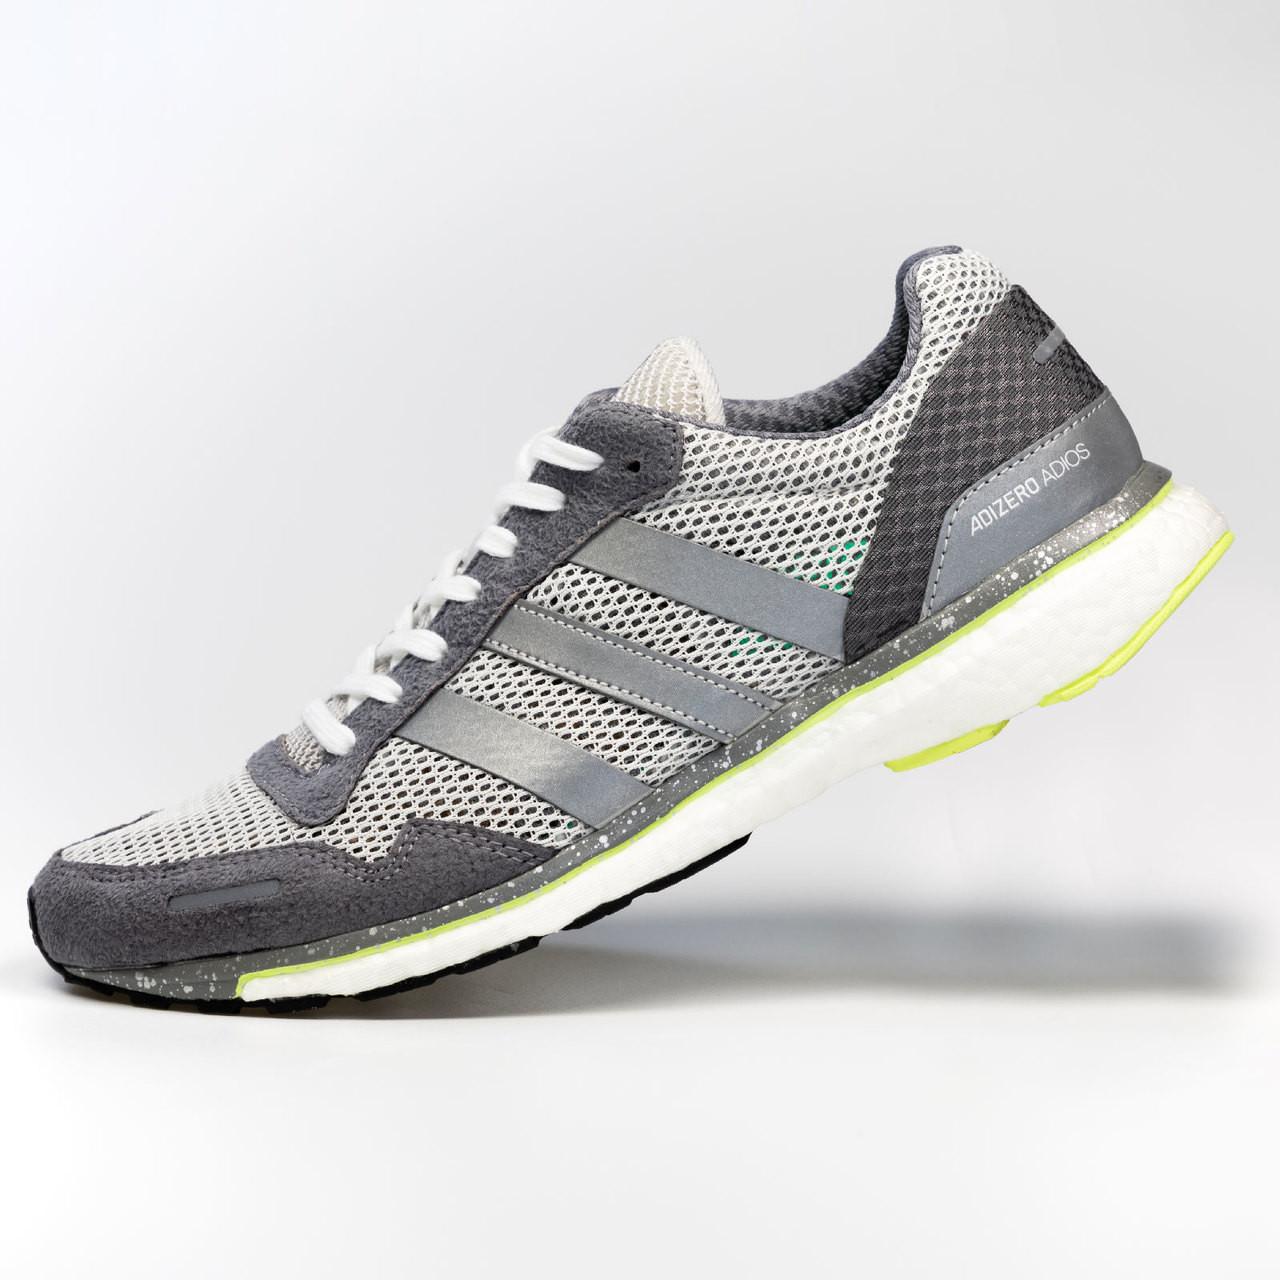 270999c66eeb ... Adidas Adizero Adios 3 Womens Sneakers BB6410 - Silver ...